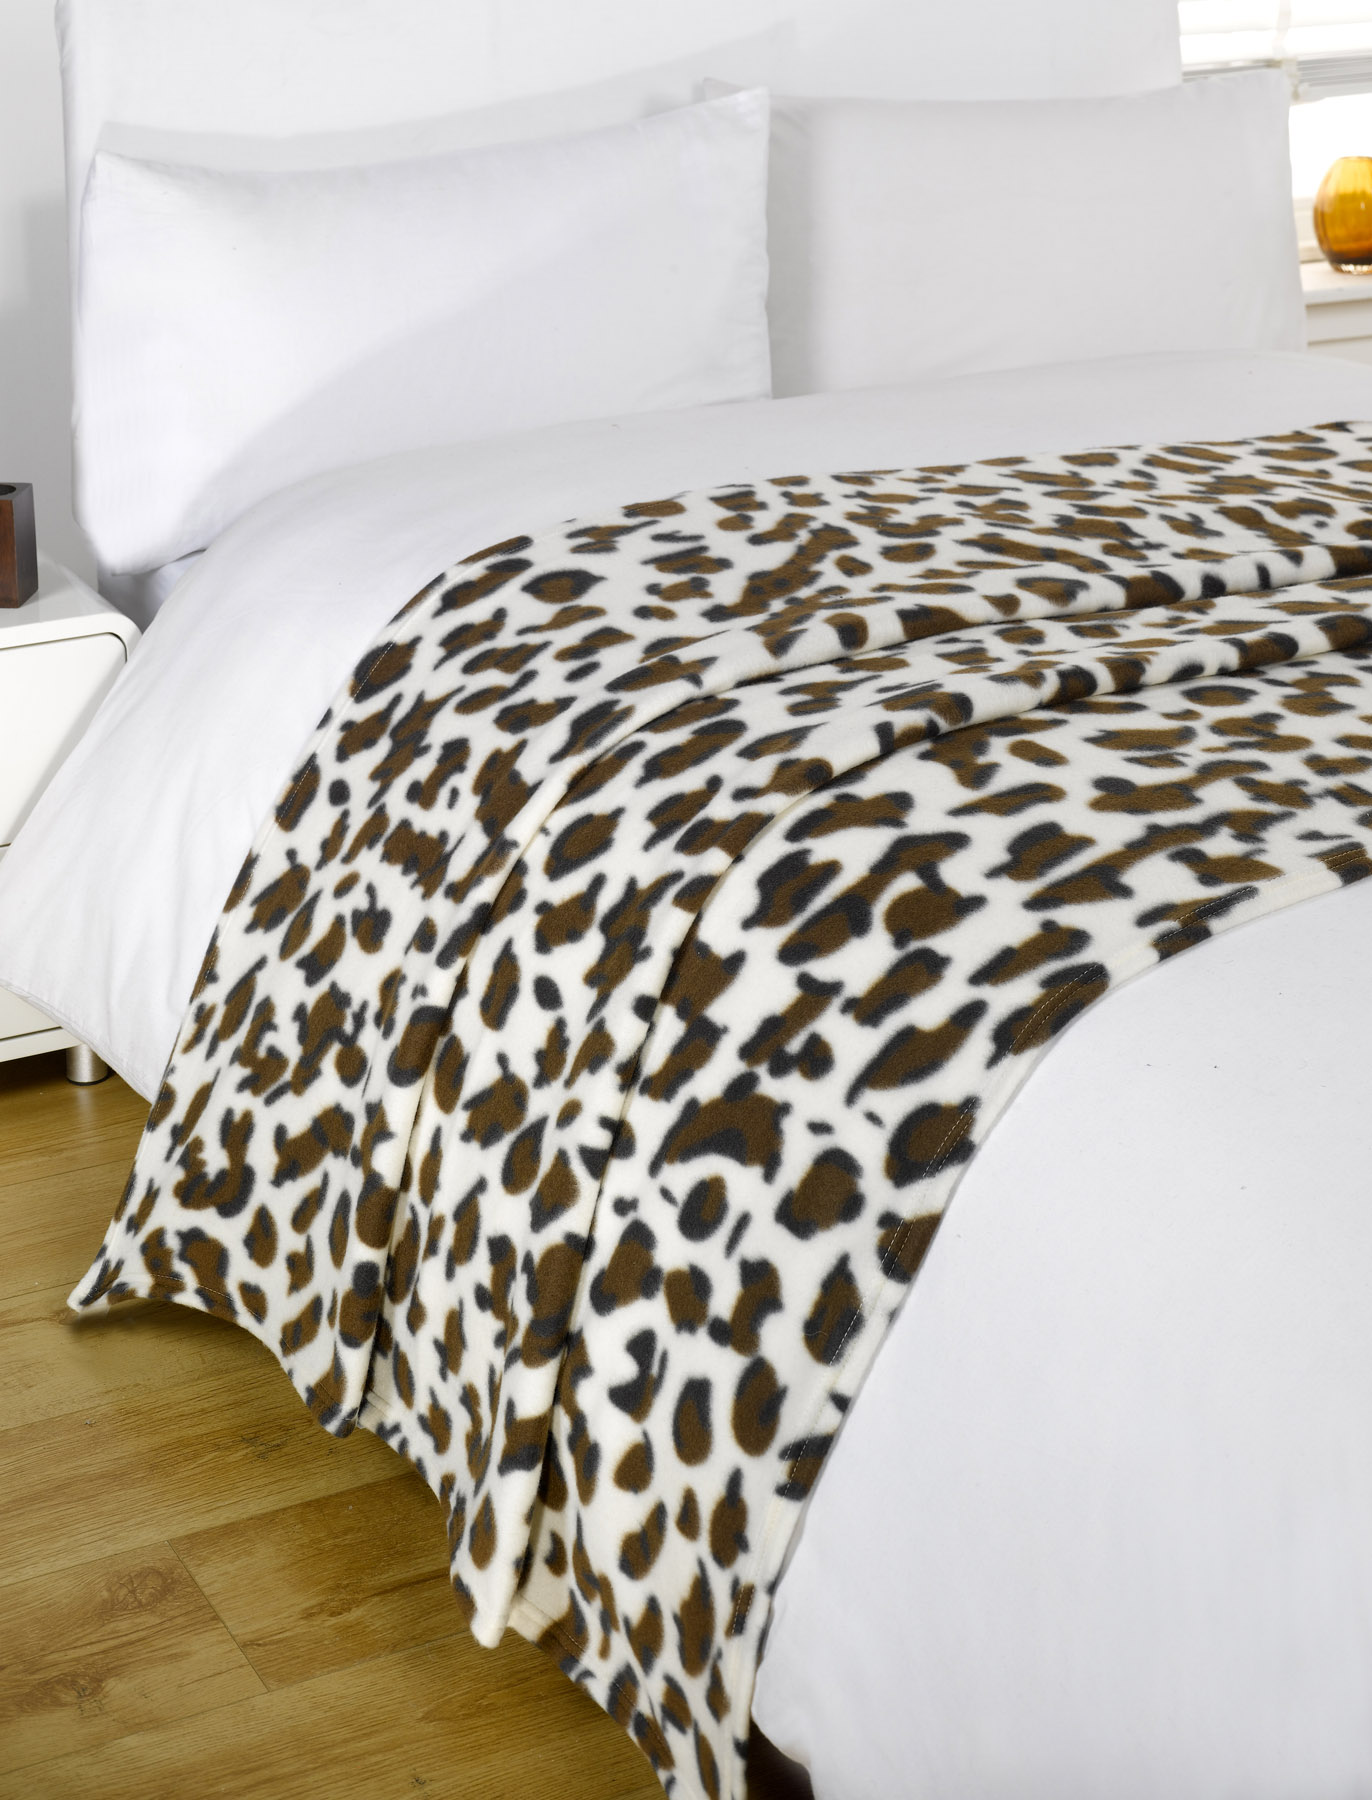 Dreamscene-Warm-Soft-Plain-Fleece-Throw-Over-Large-Decorative-Sofa-Bed-Blanket